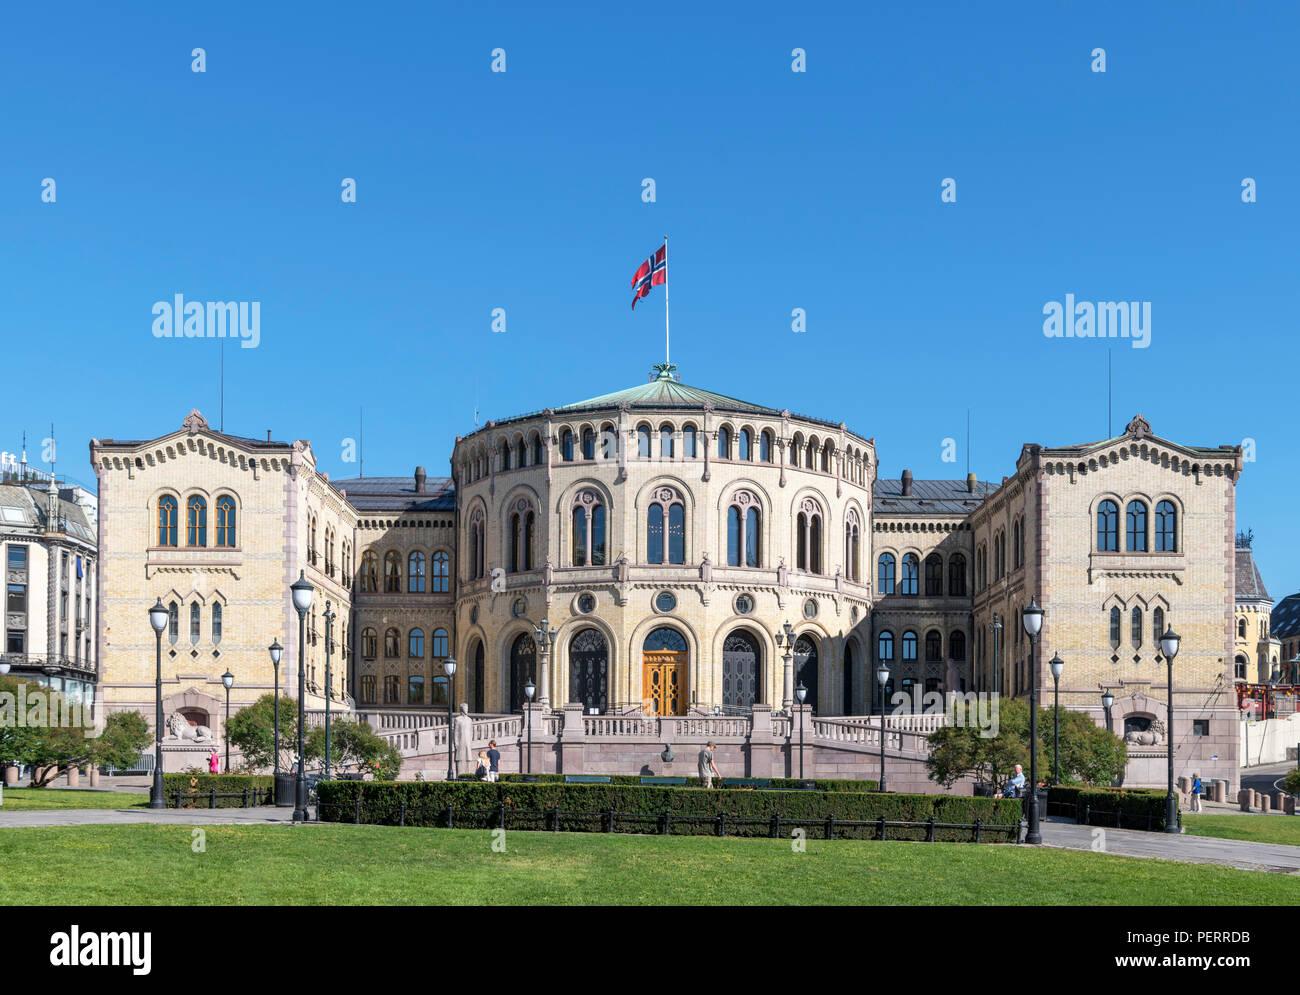 The Norwegian Parliament building (Stortinget), Oslo, Norway - Stock Image